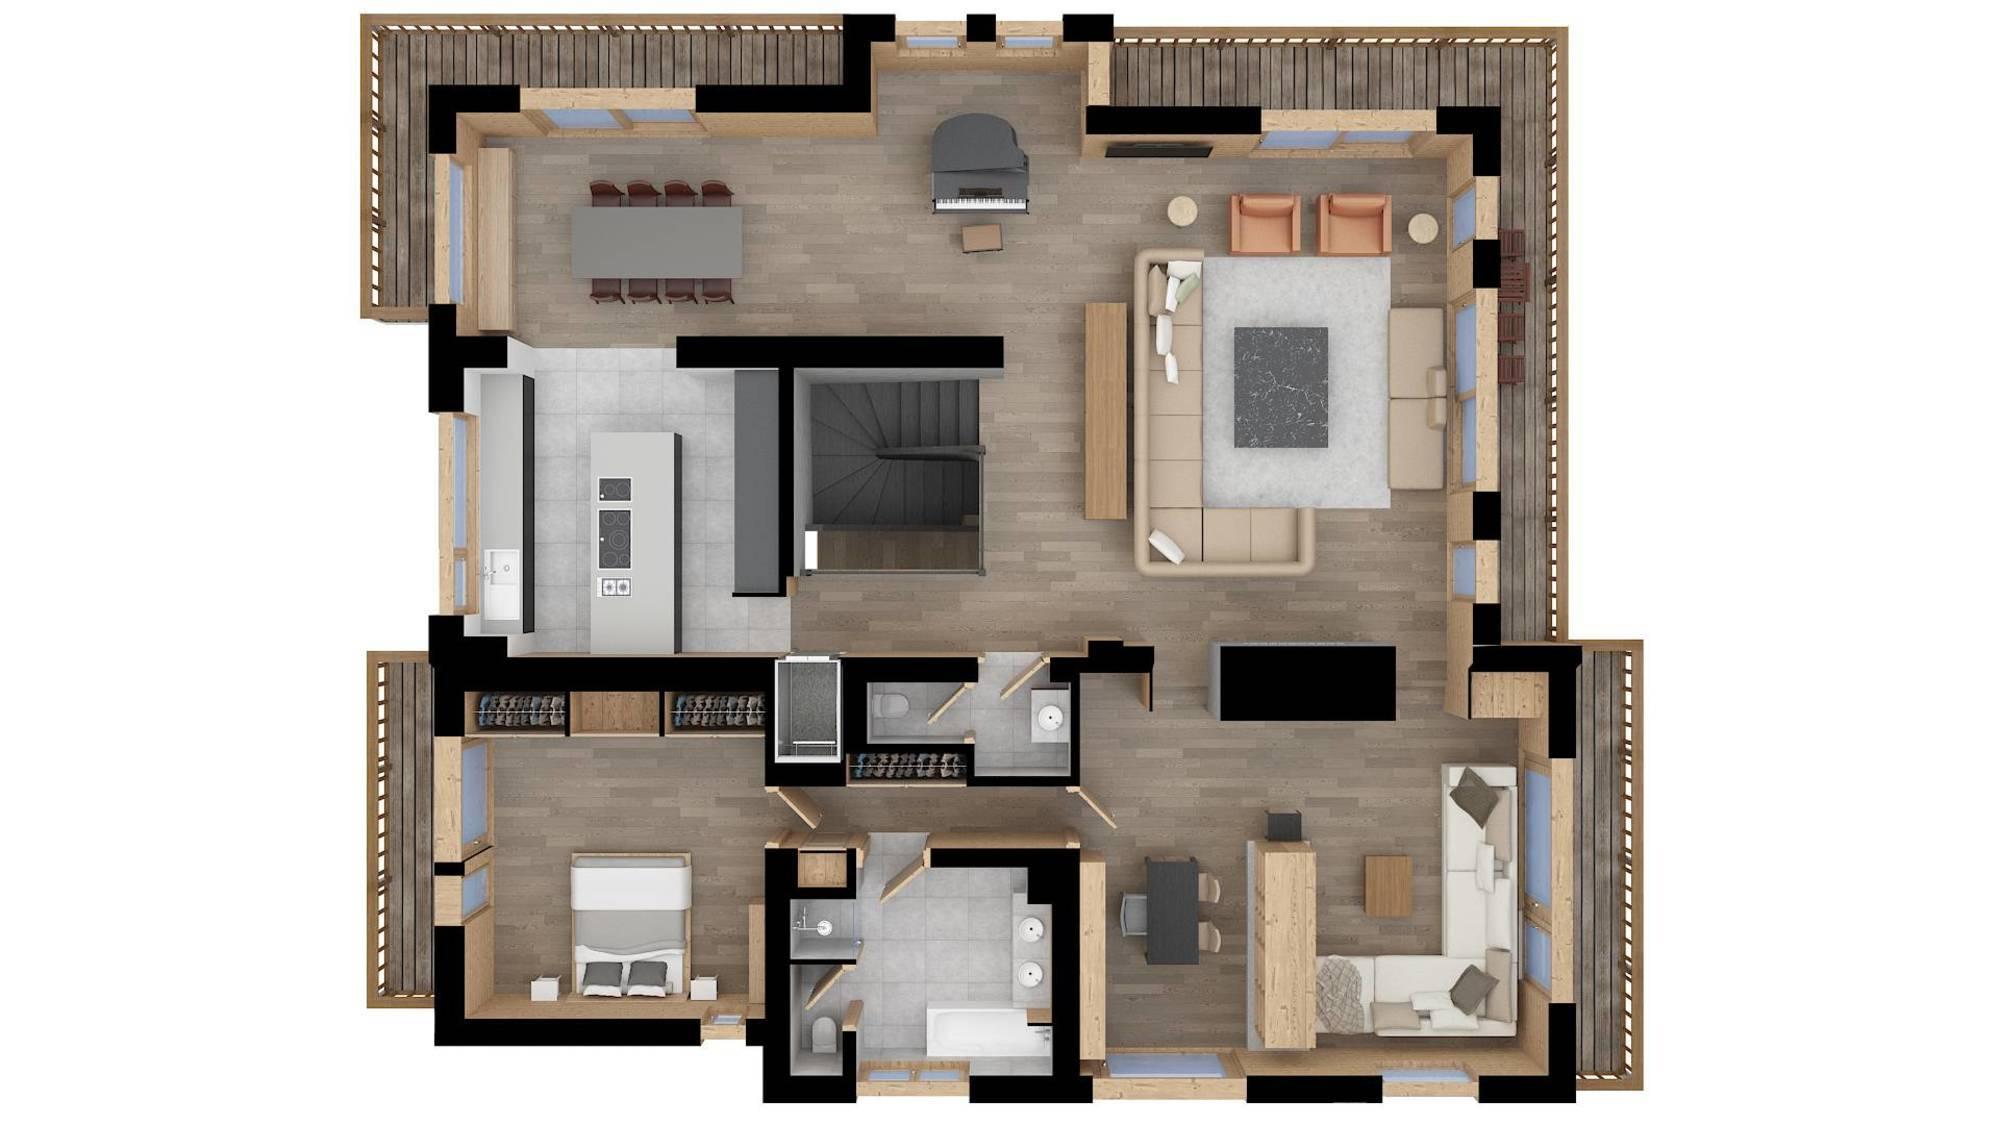 Chalet Des Sens Megeve Floor Plan 1